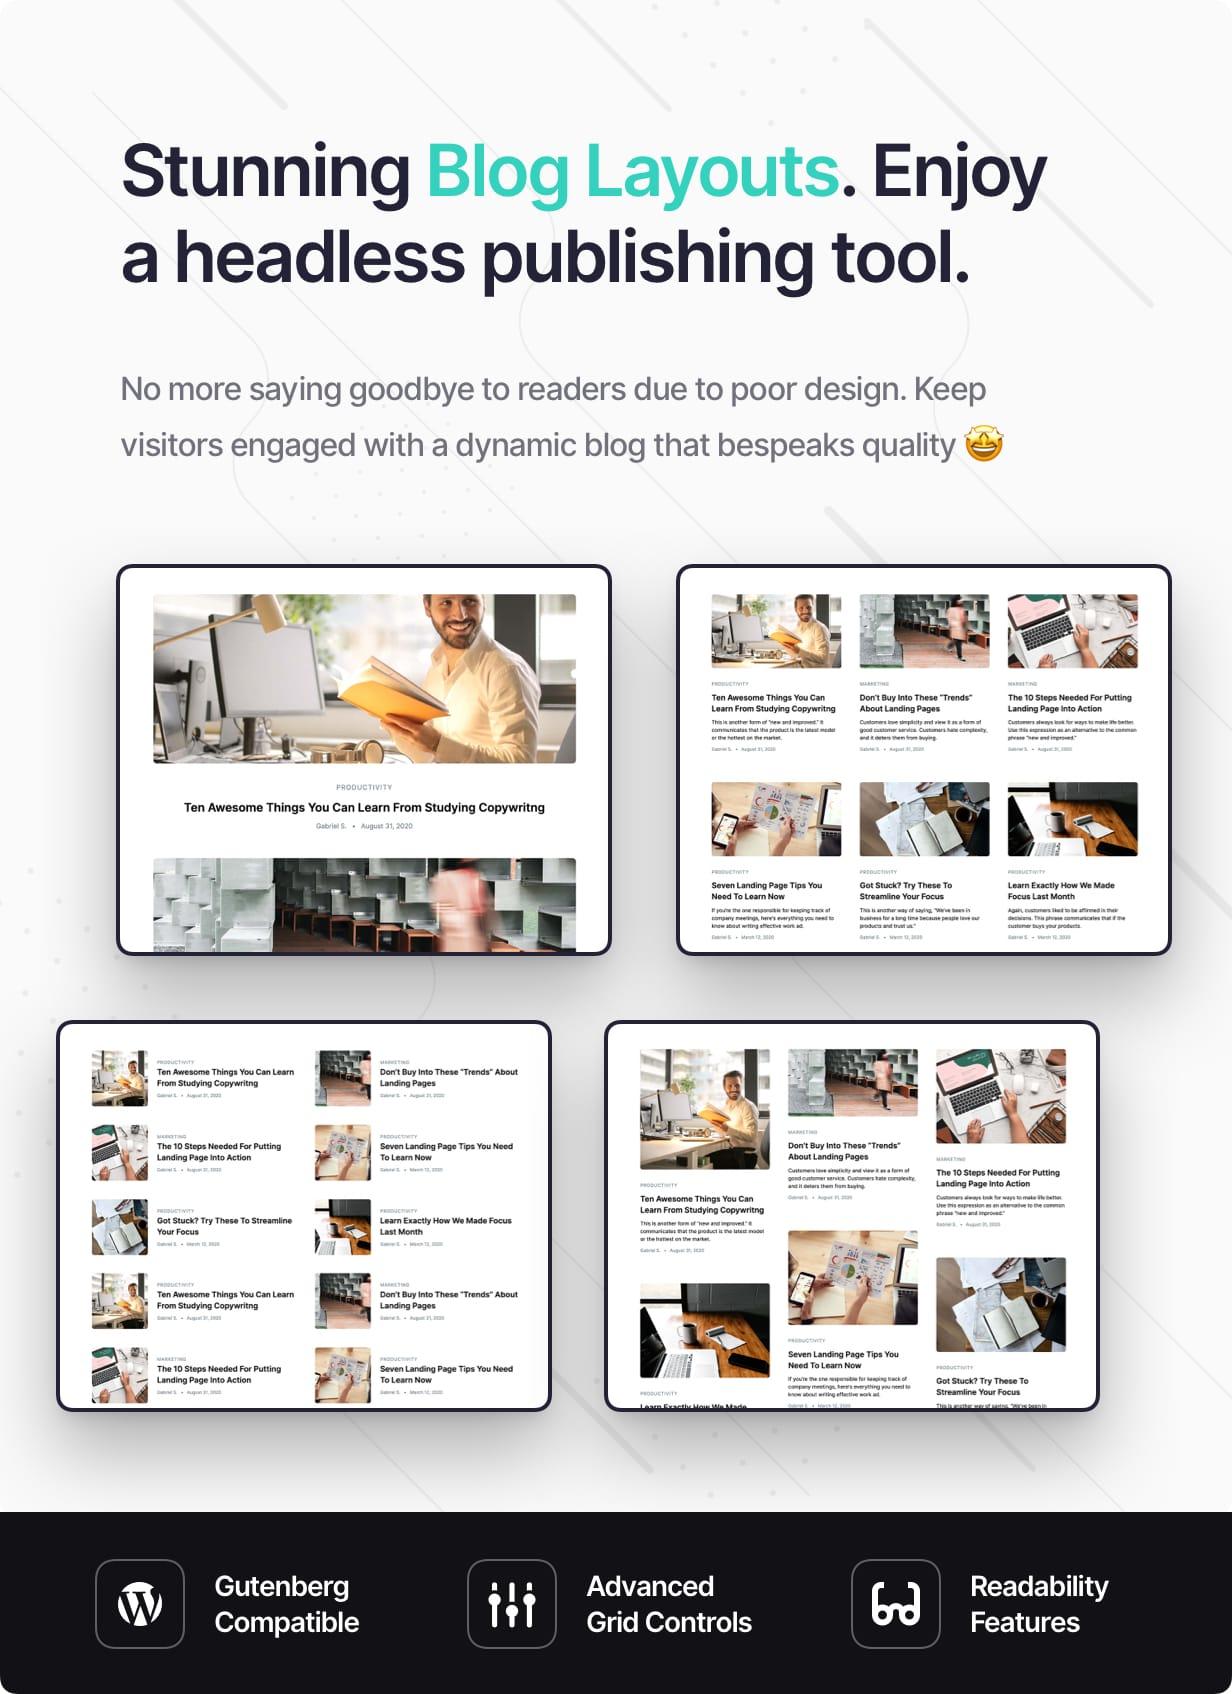 Stunning Blog Layouts. Enjoy a headless publishing tool.